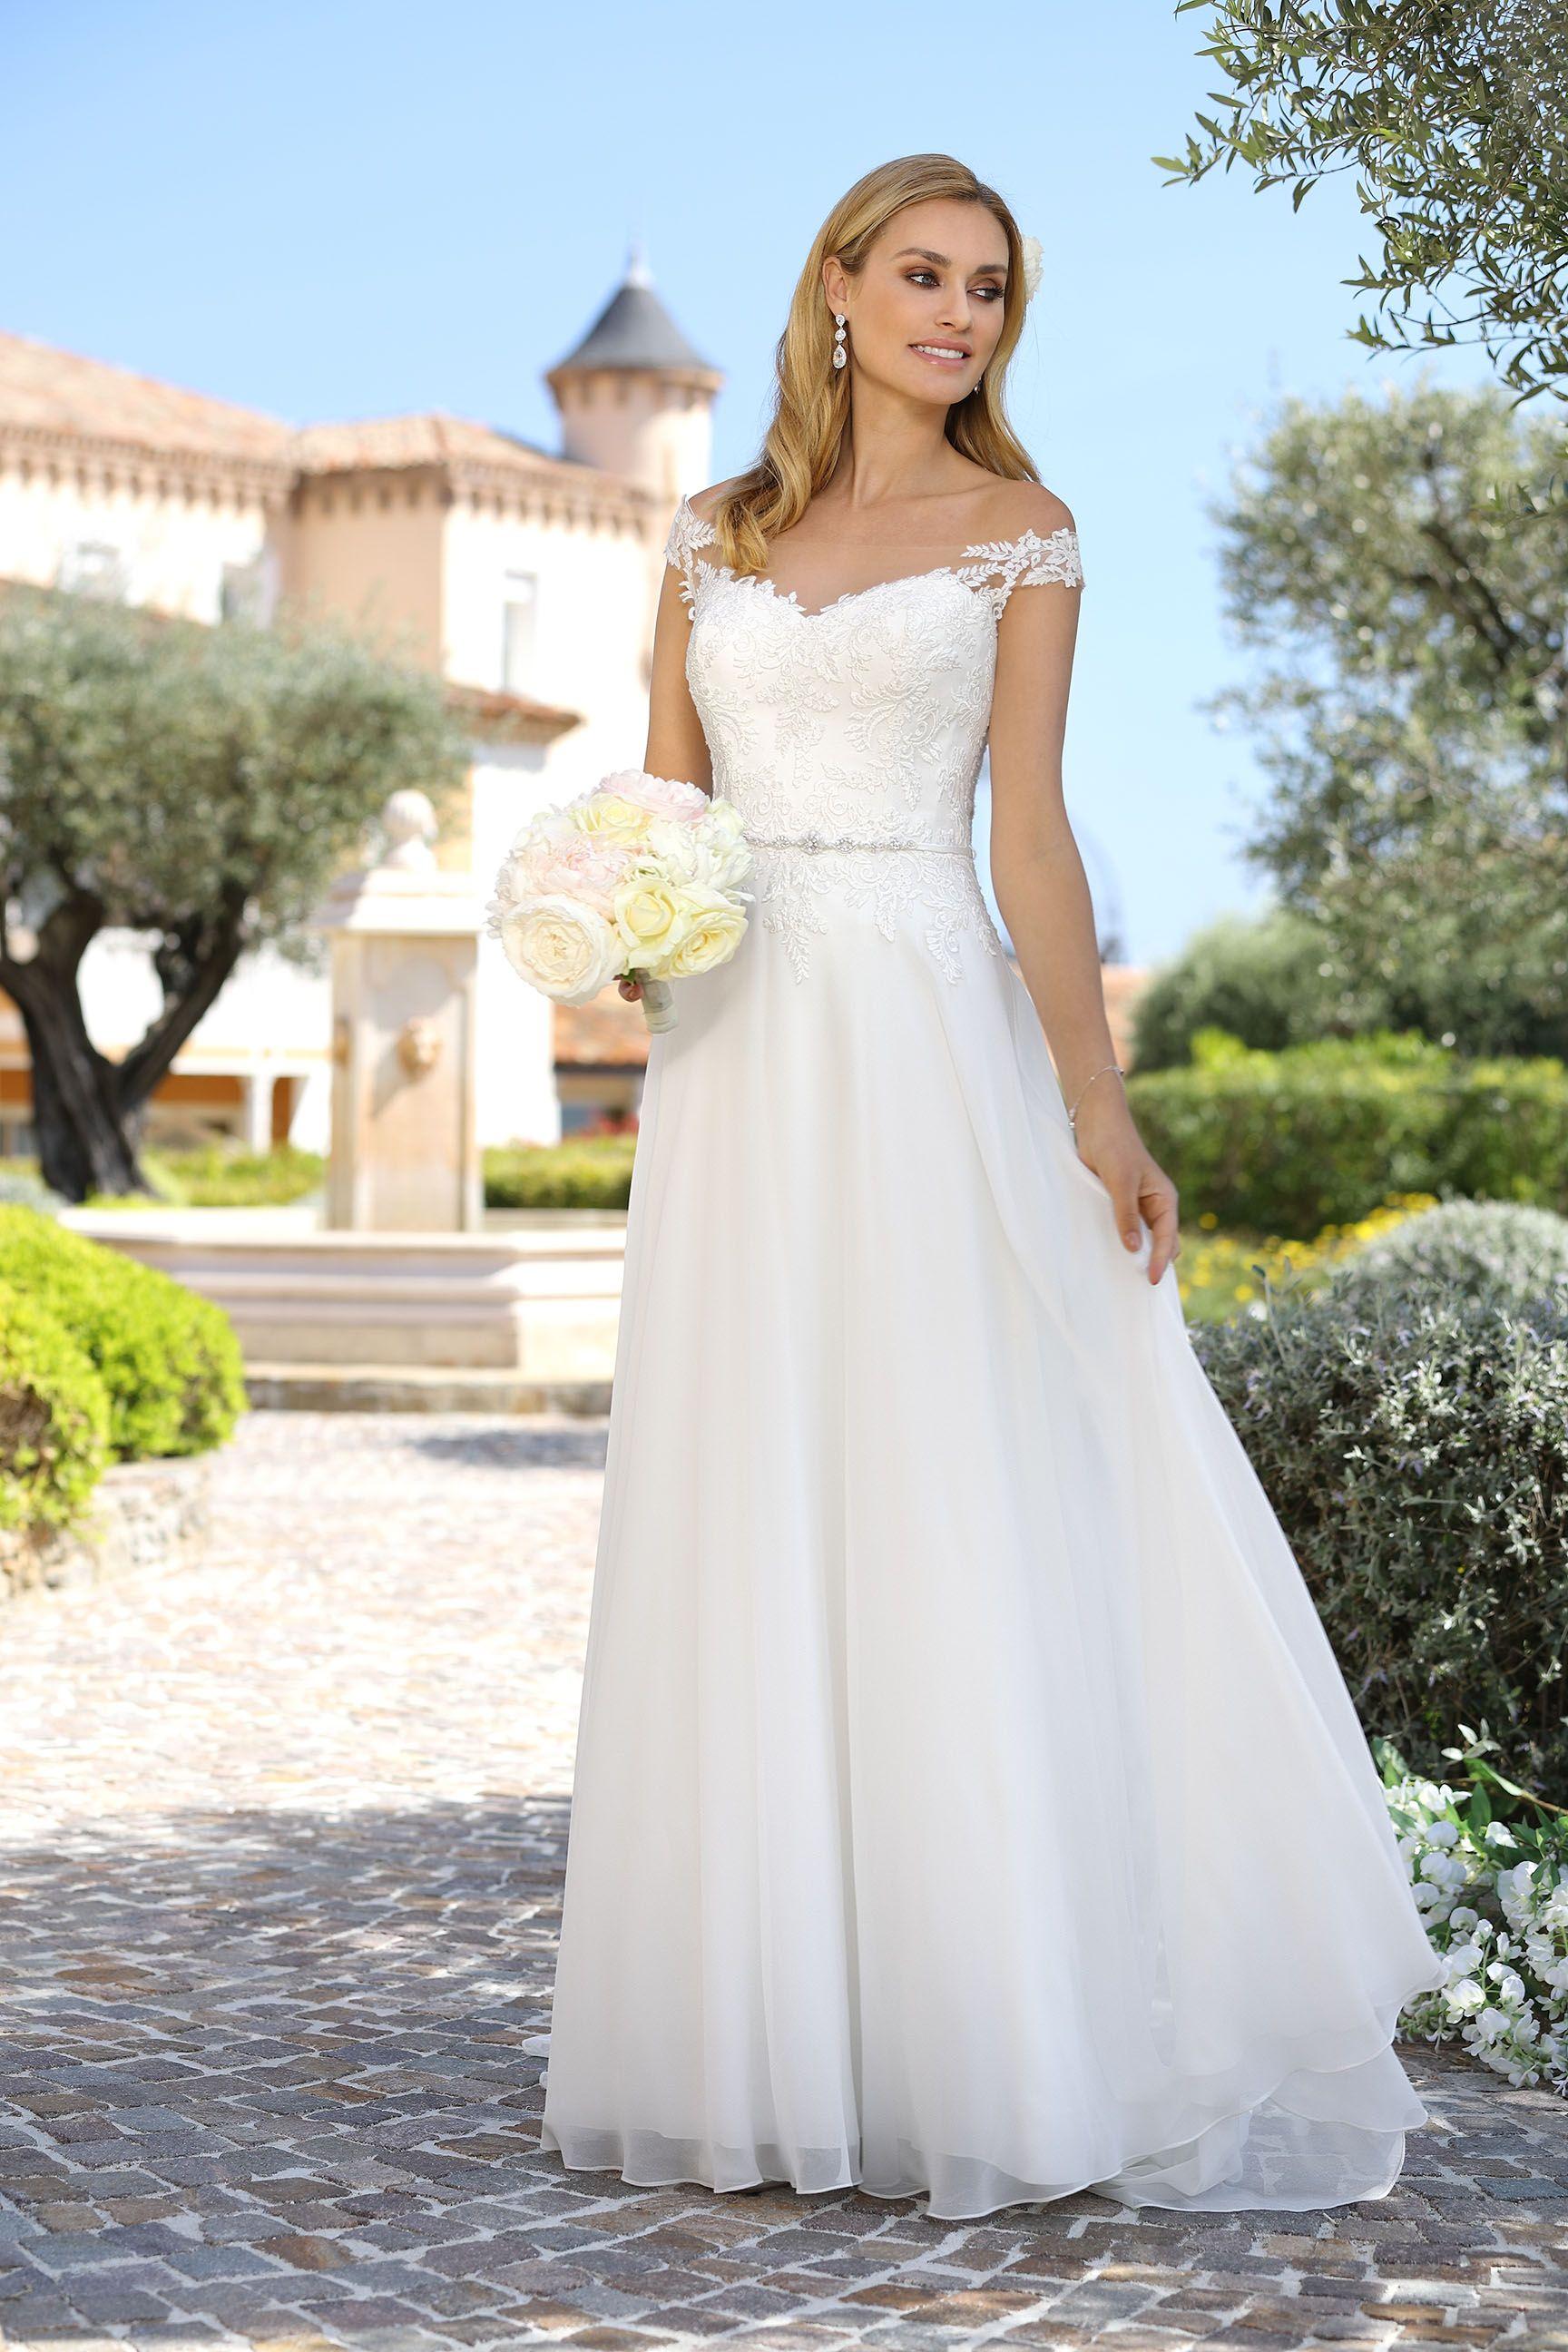 Affordable bohemian wedding dresses  g   varios  Pinterest  Dream wedding